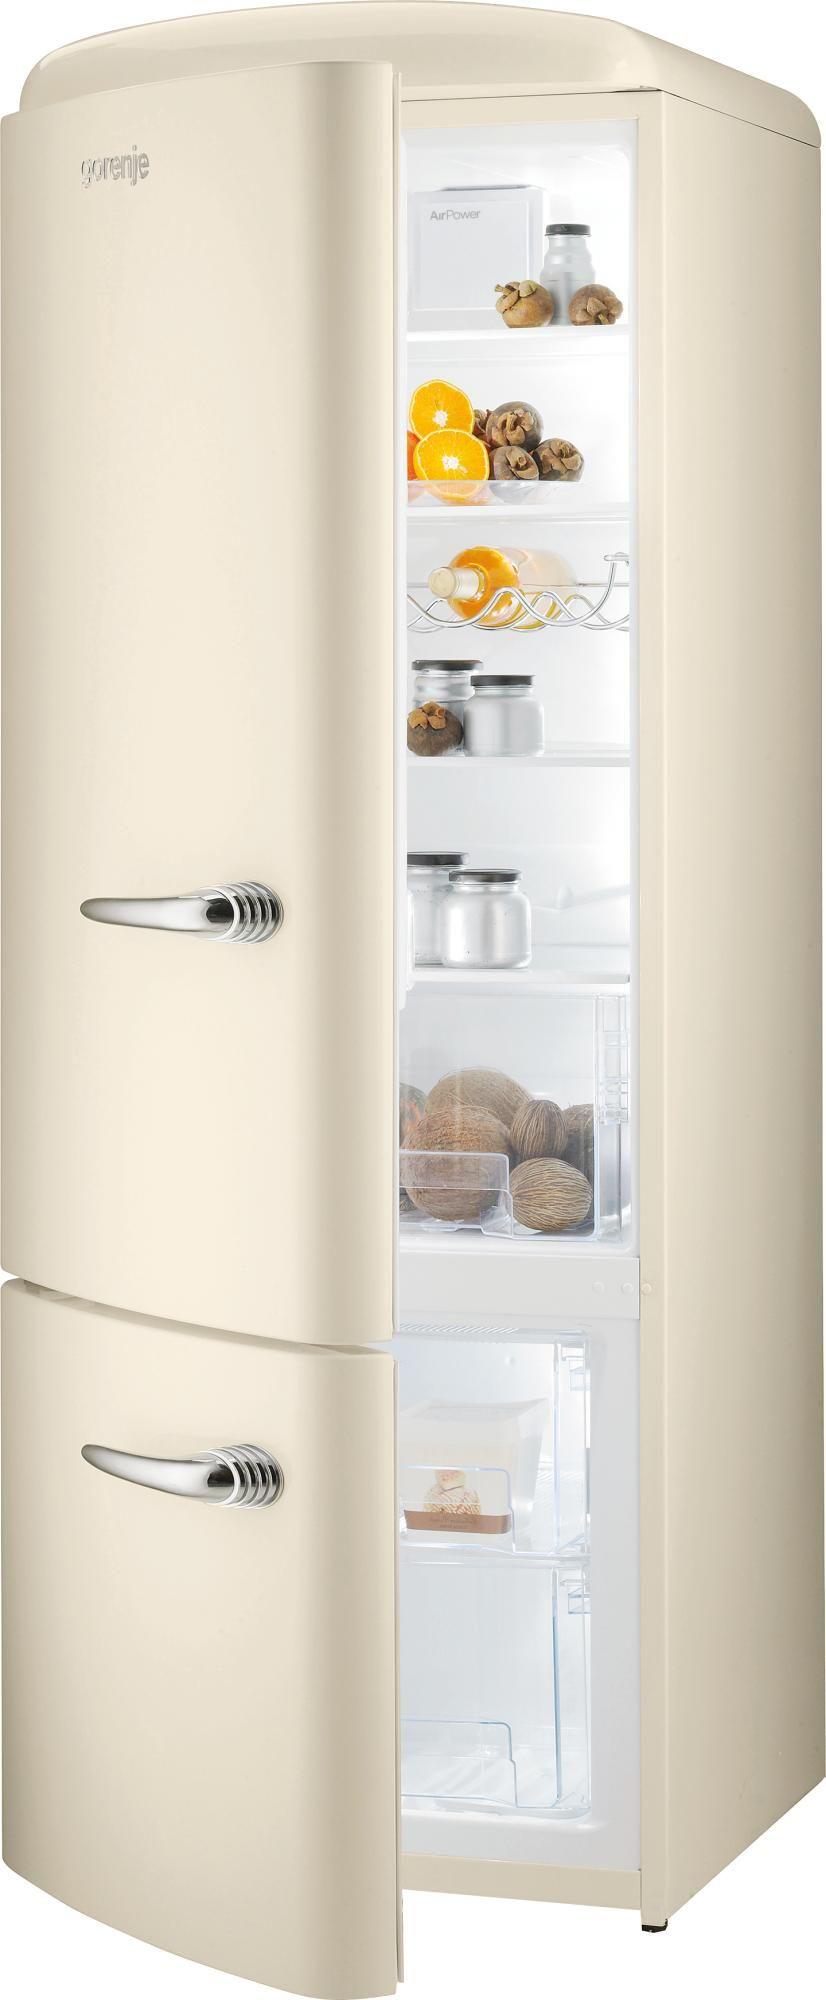 RK60319OC-L - Kühl-Gefrier-Kombination - Gorenje   Kühlschrank ...